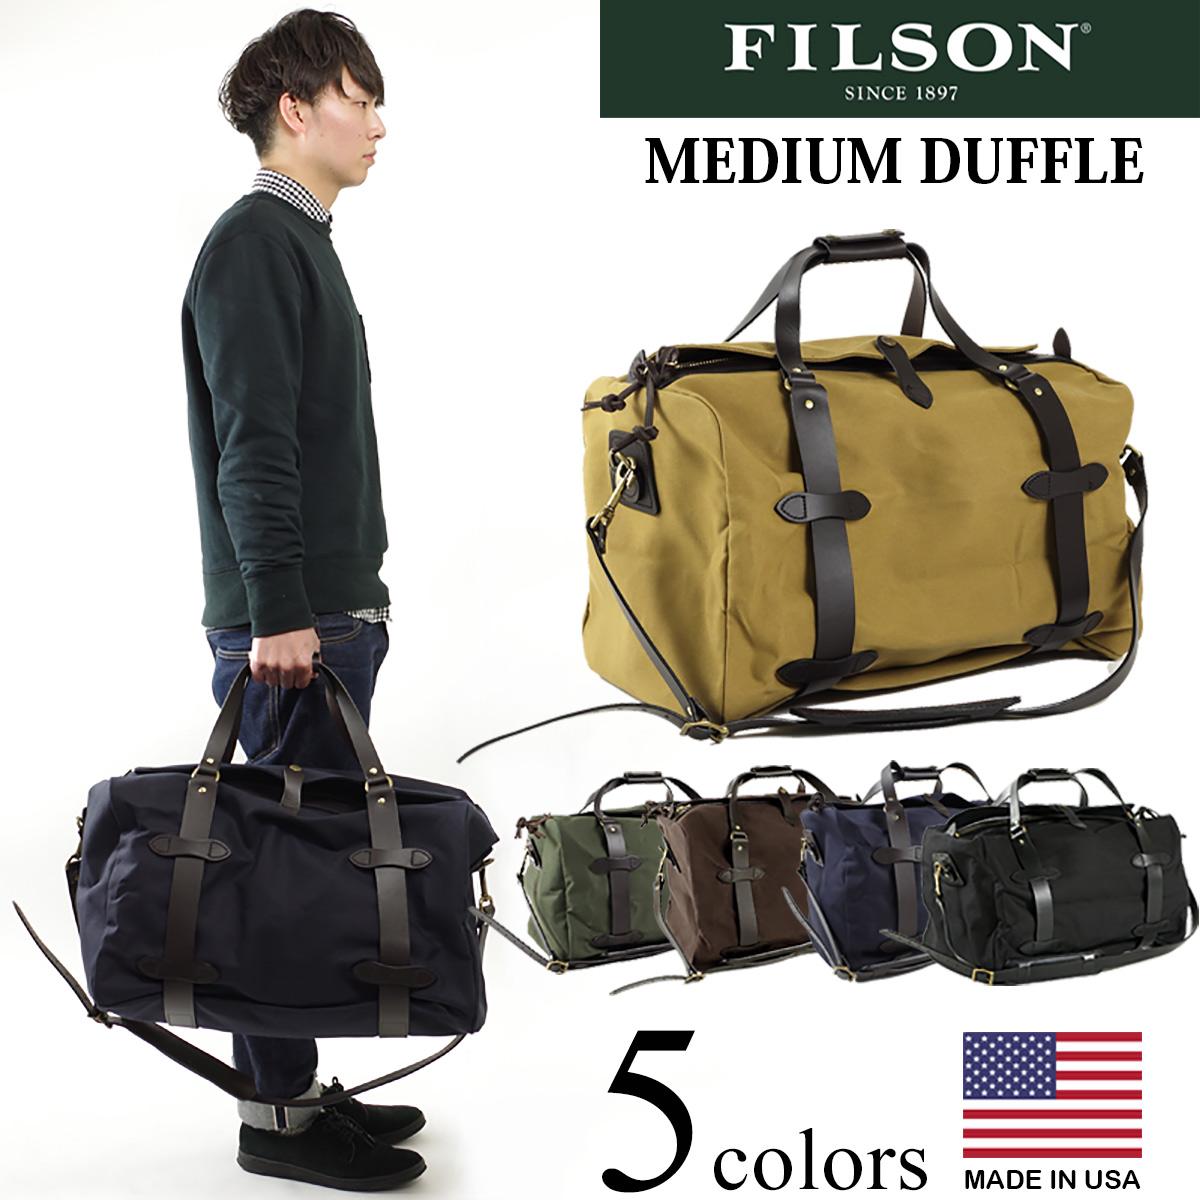 Filson Medium Canvas Duffel Bag Duffle Made In The United States